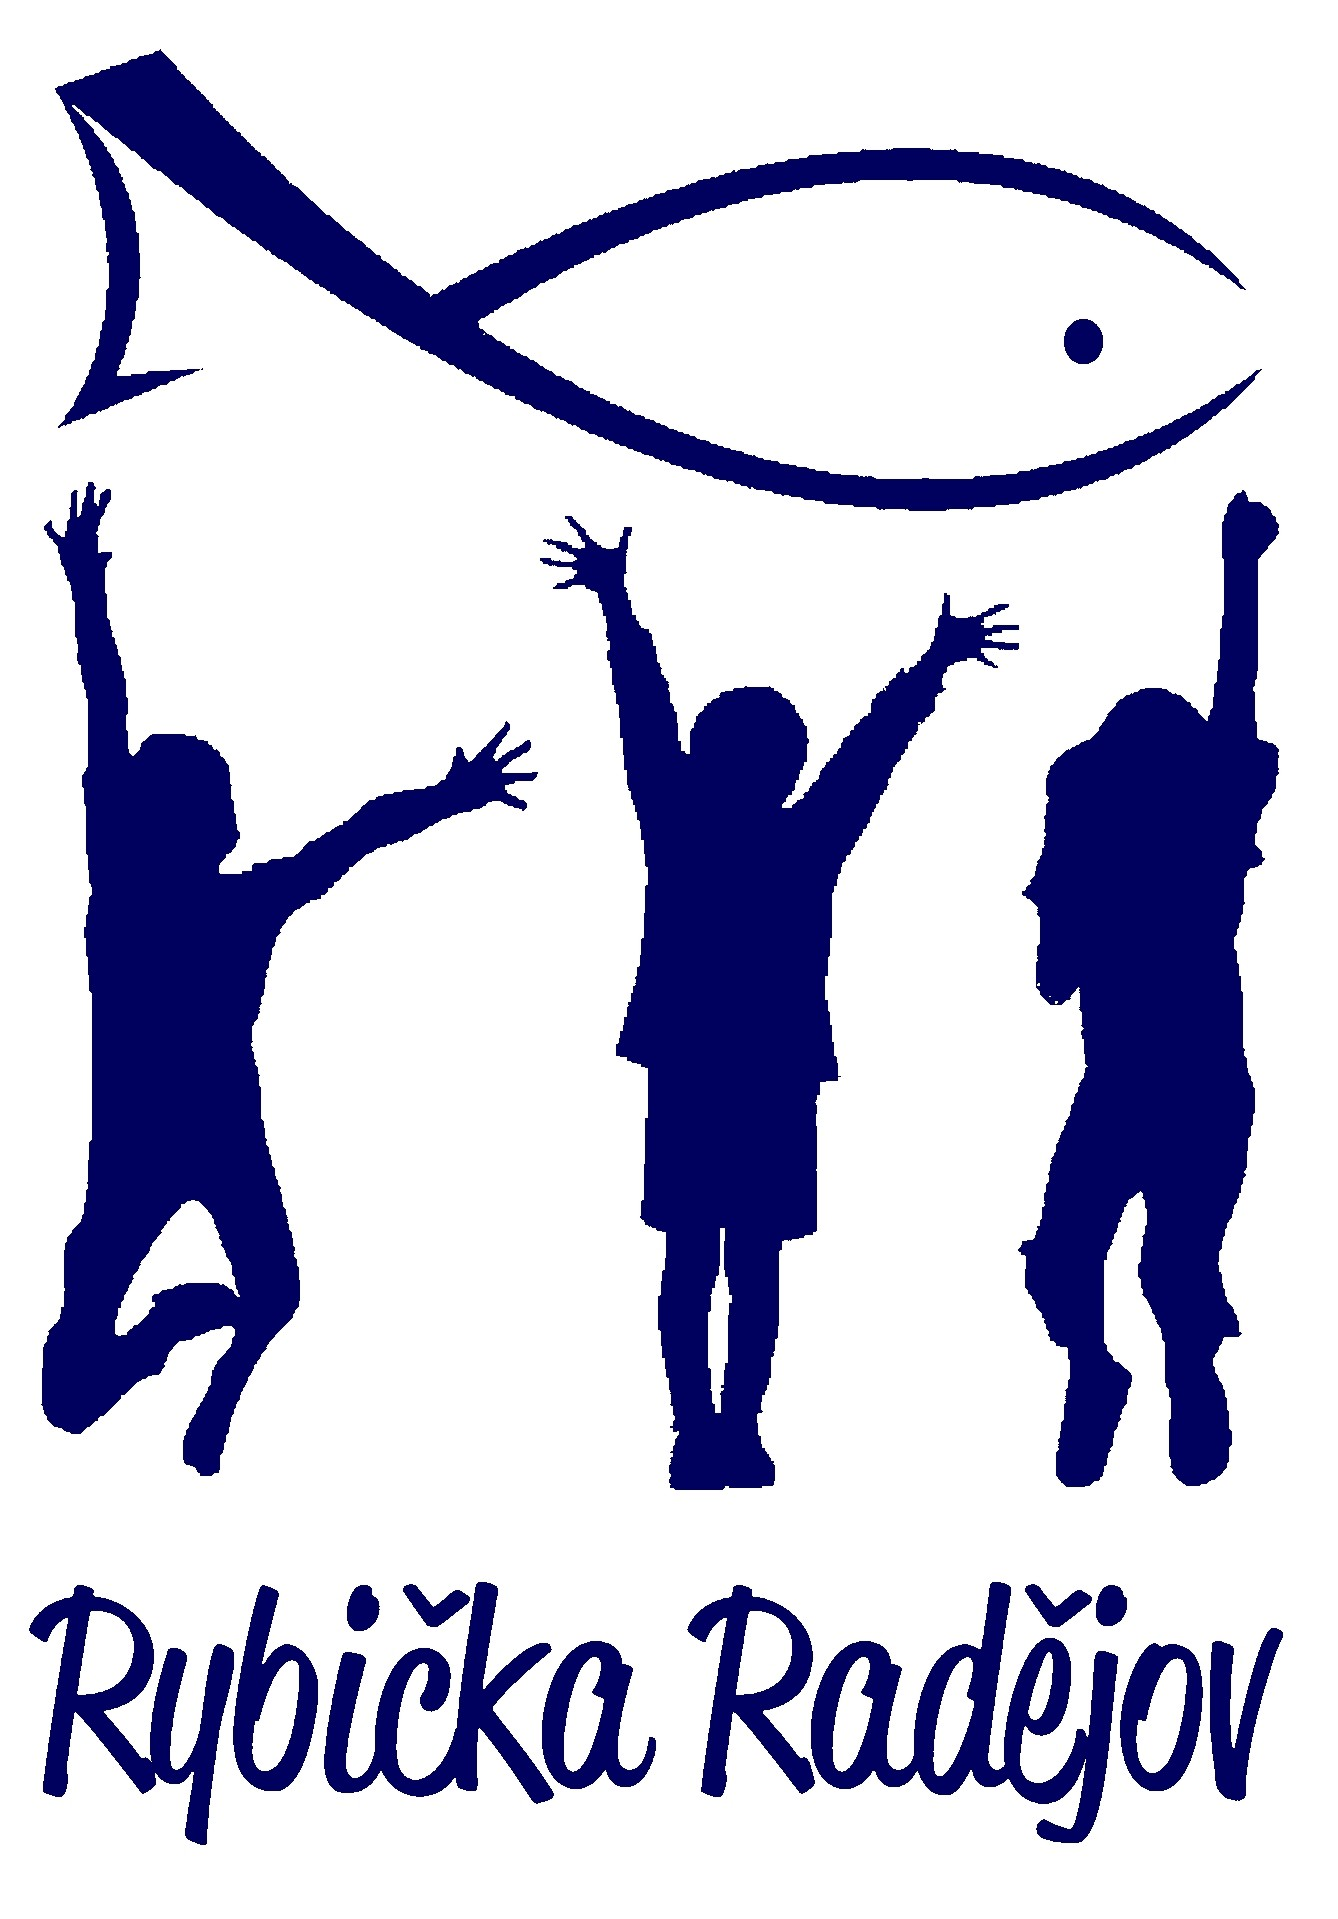 rybicka radejov logo modre